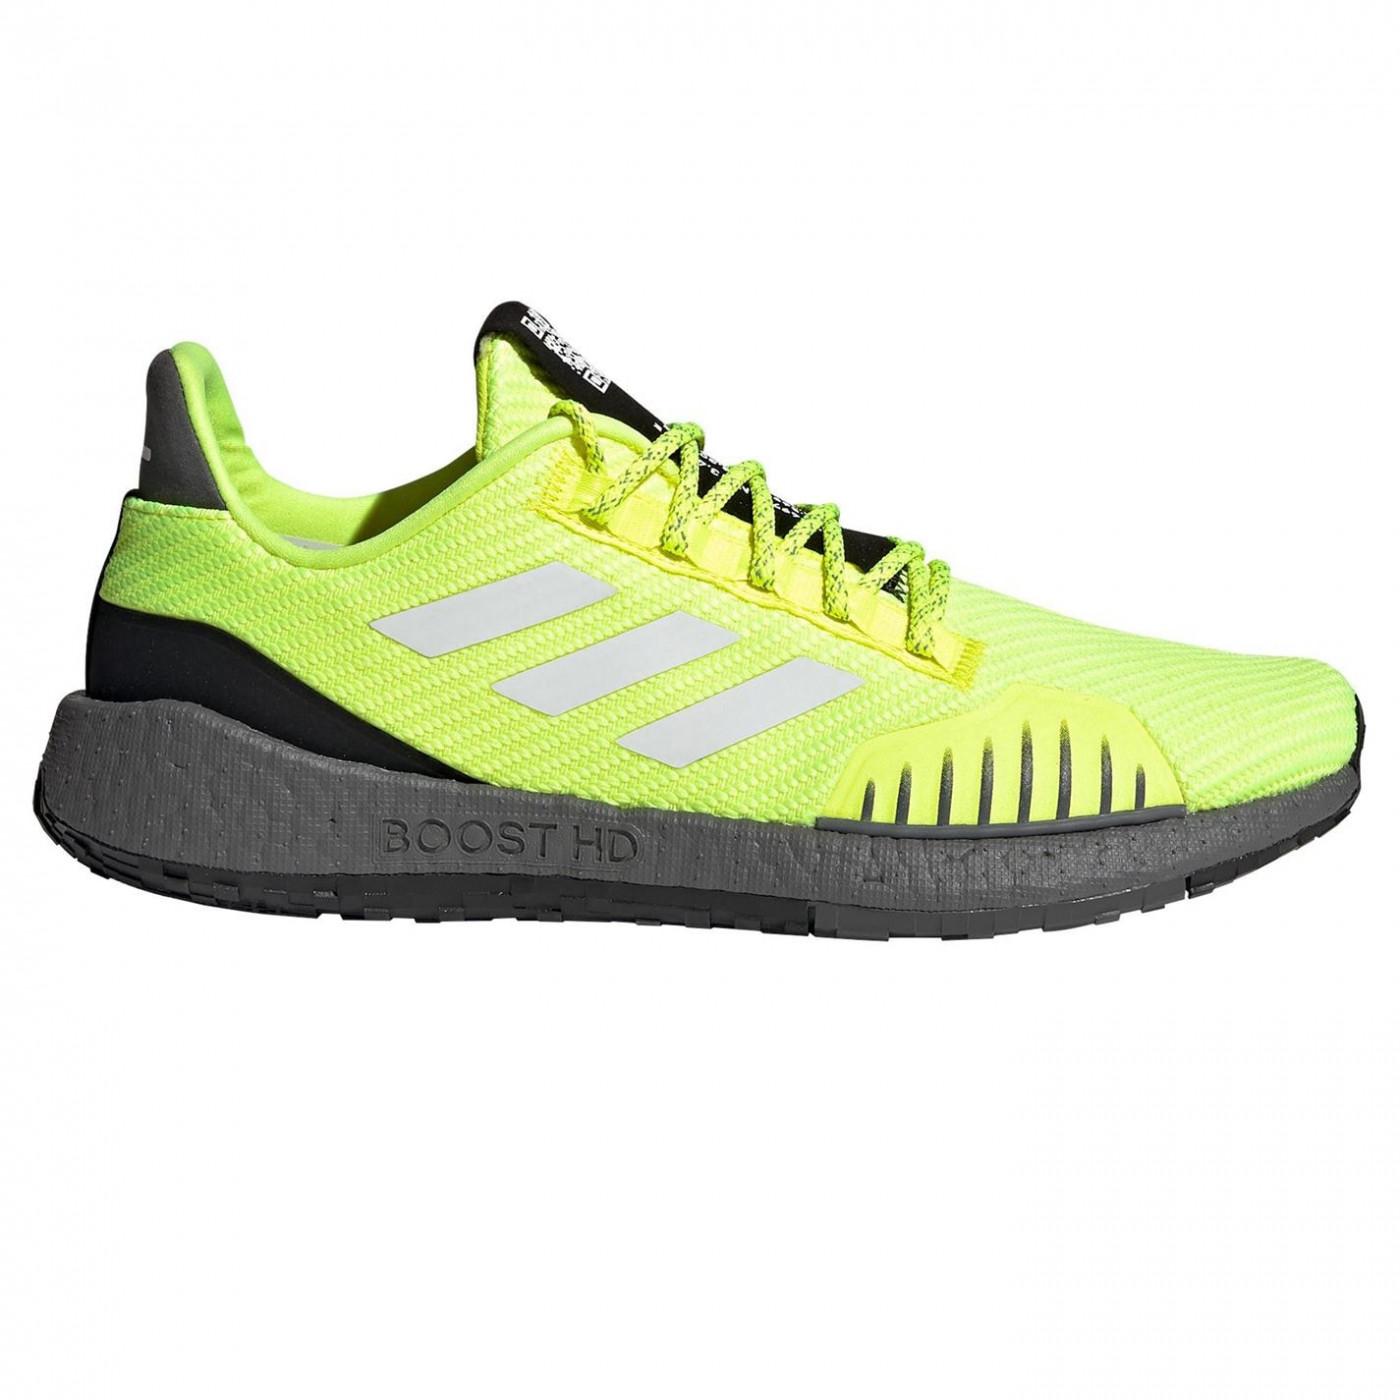 Men's running shoes Adidas Pulseboost HD